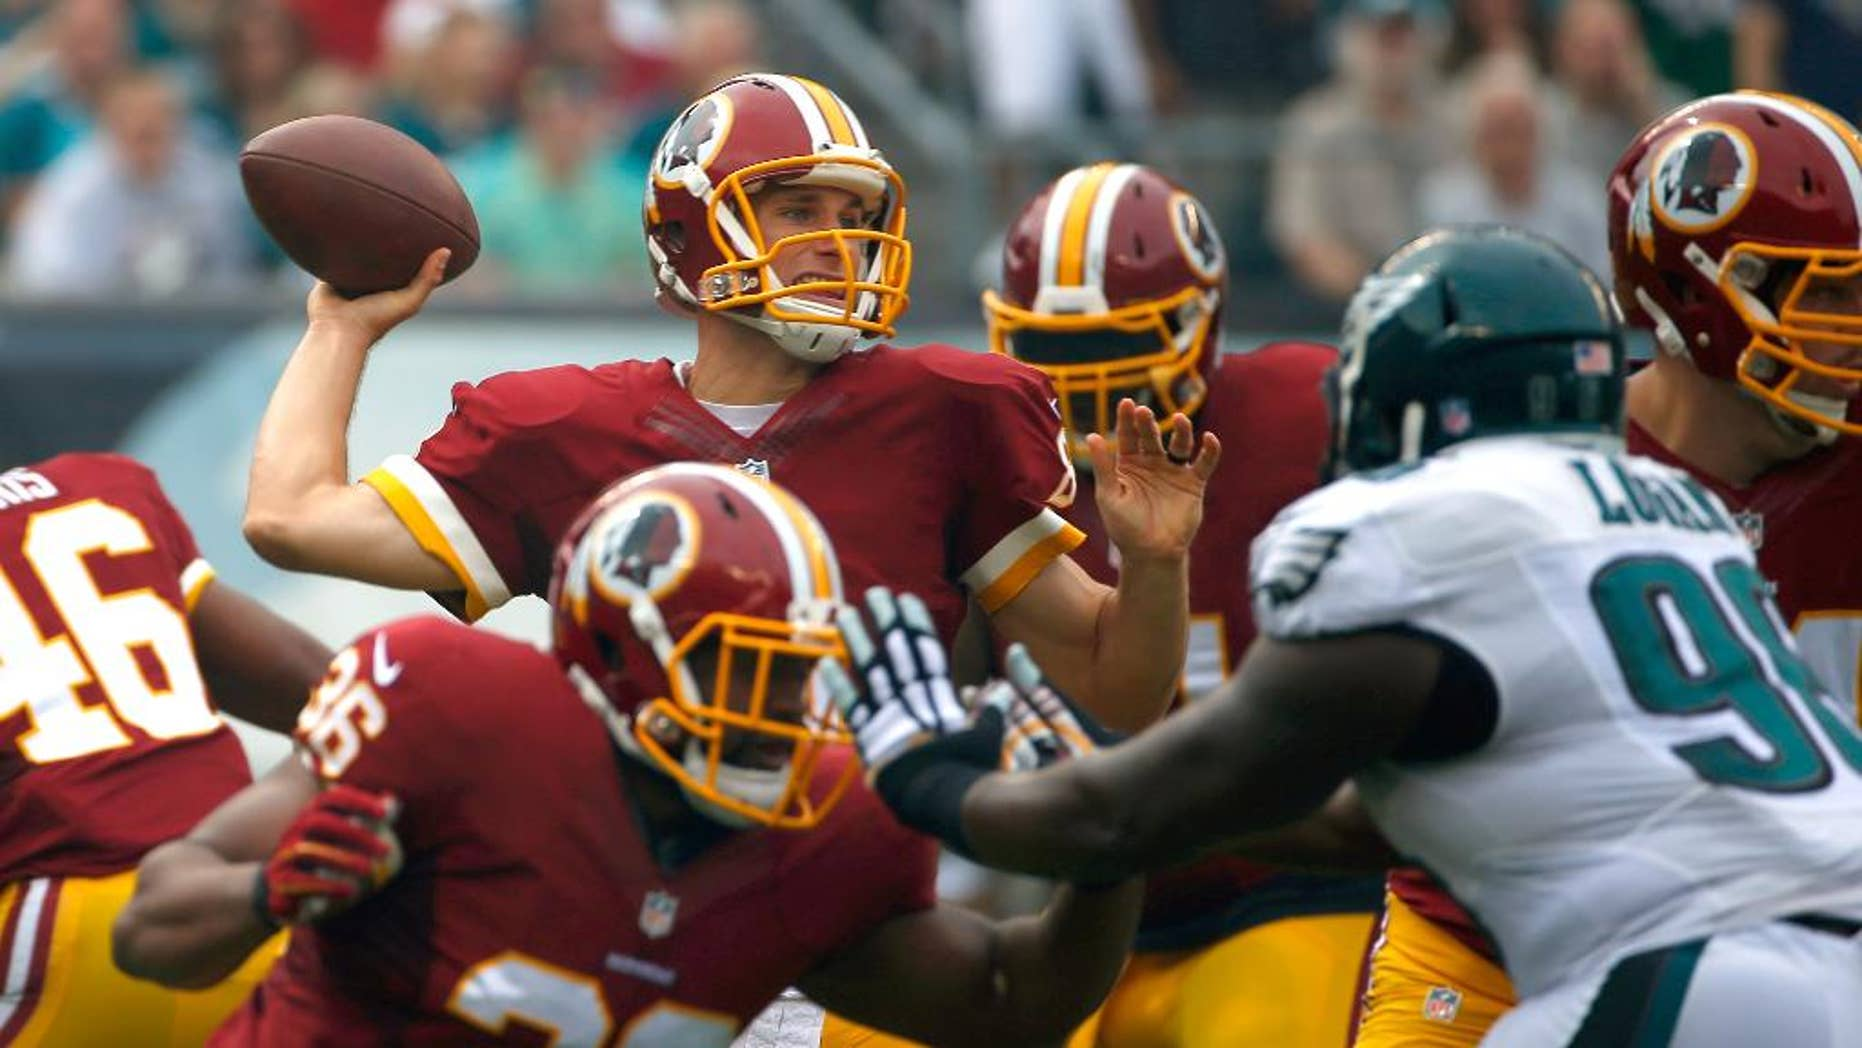 Washington Redskins' Kirk Cousins passes during the first half of an NFL football game against the Philadelphia Eagles, Sunday, Sept. 21, 2014, in Philadelphia. (AP Photo/Matt Rourke)